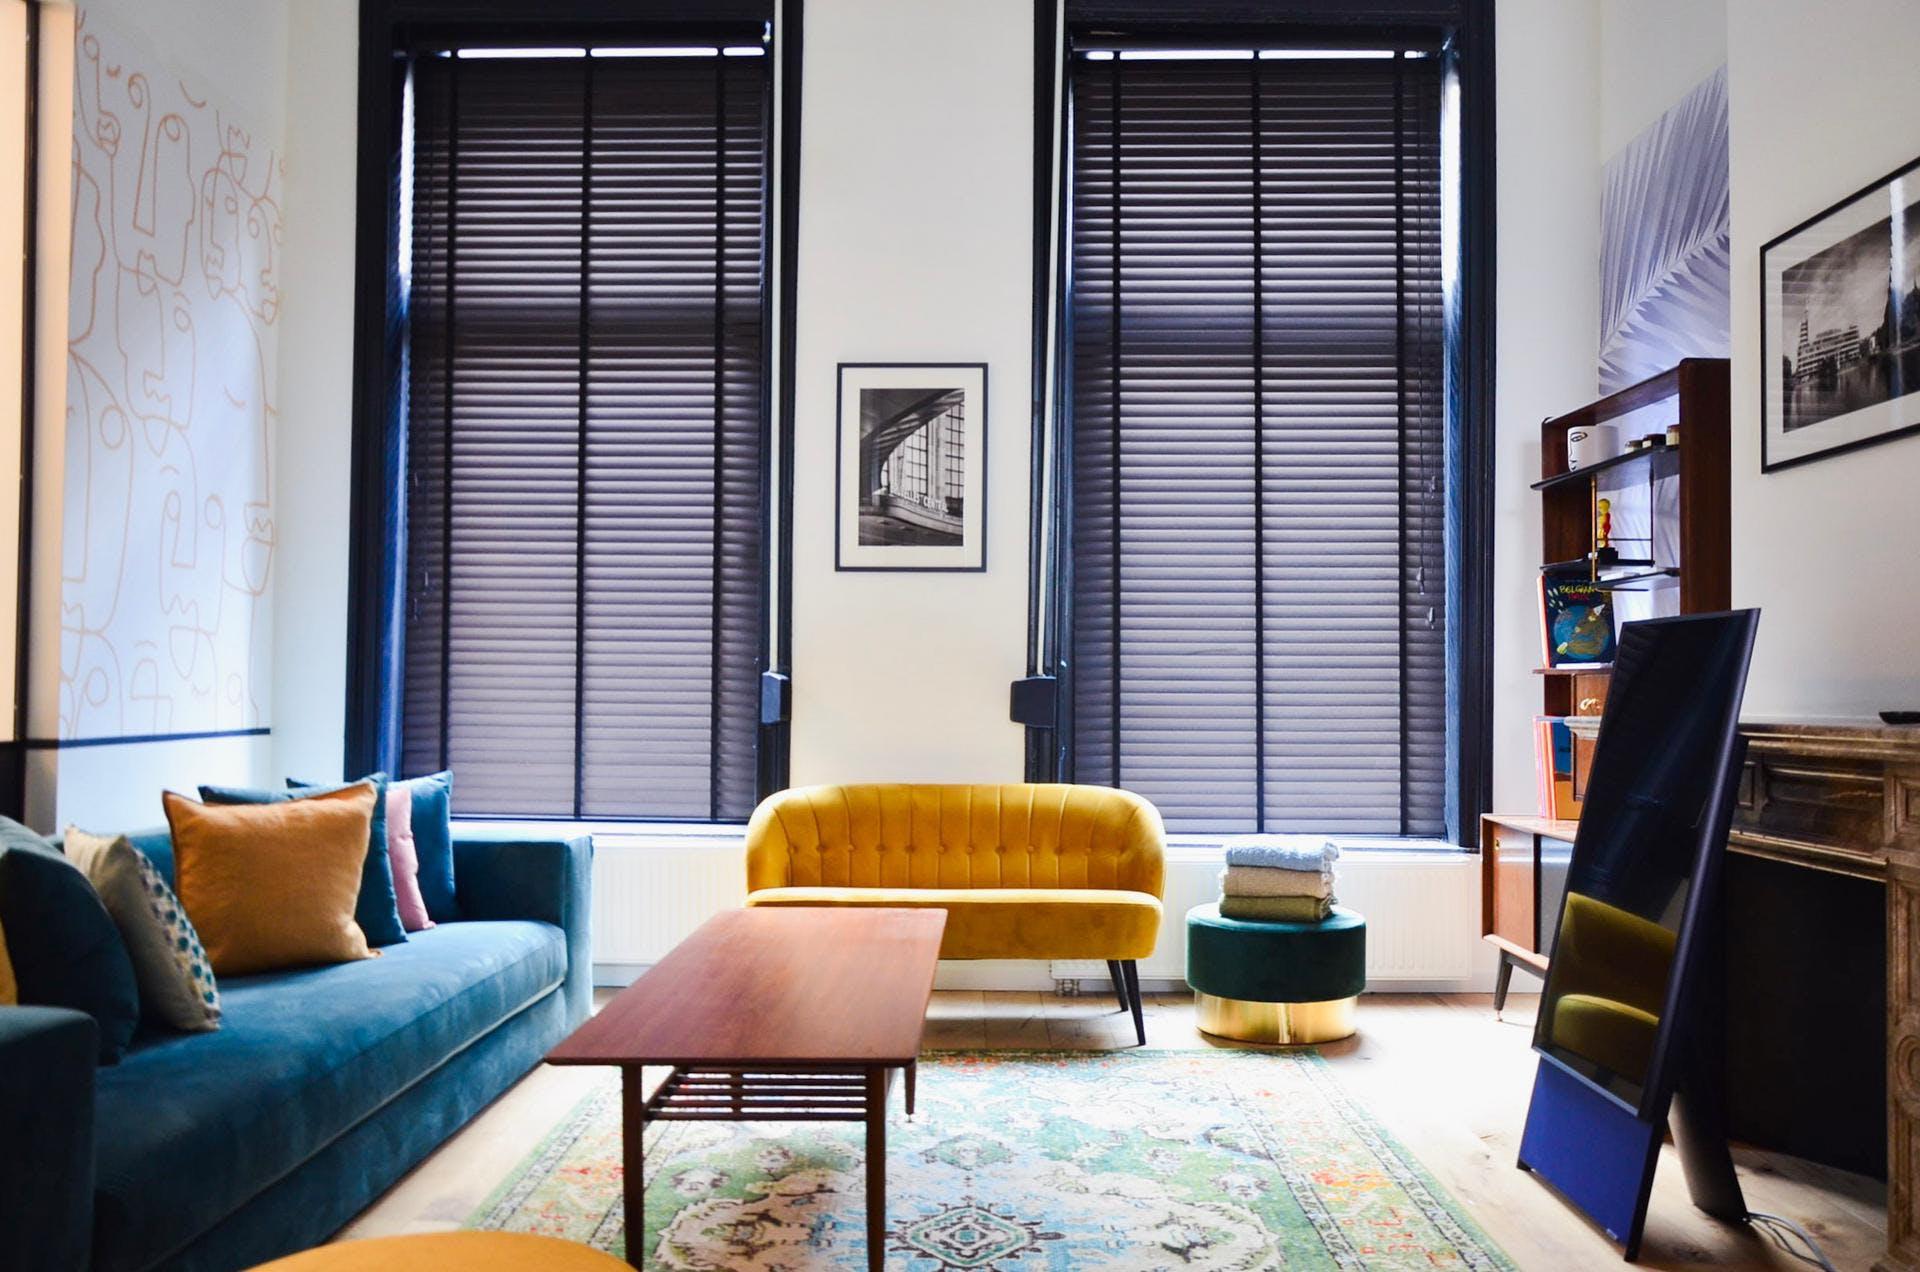 12 Residents | Place Flagey | Luxury Modern House w/ Workspace + Terrace + Backyard